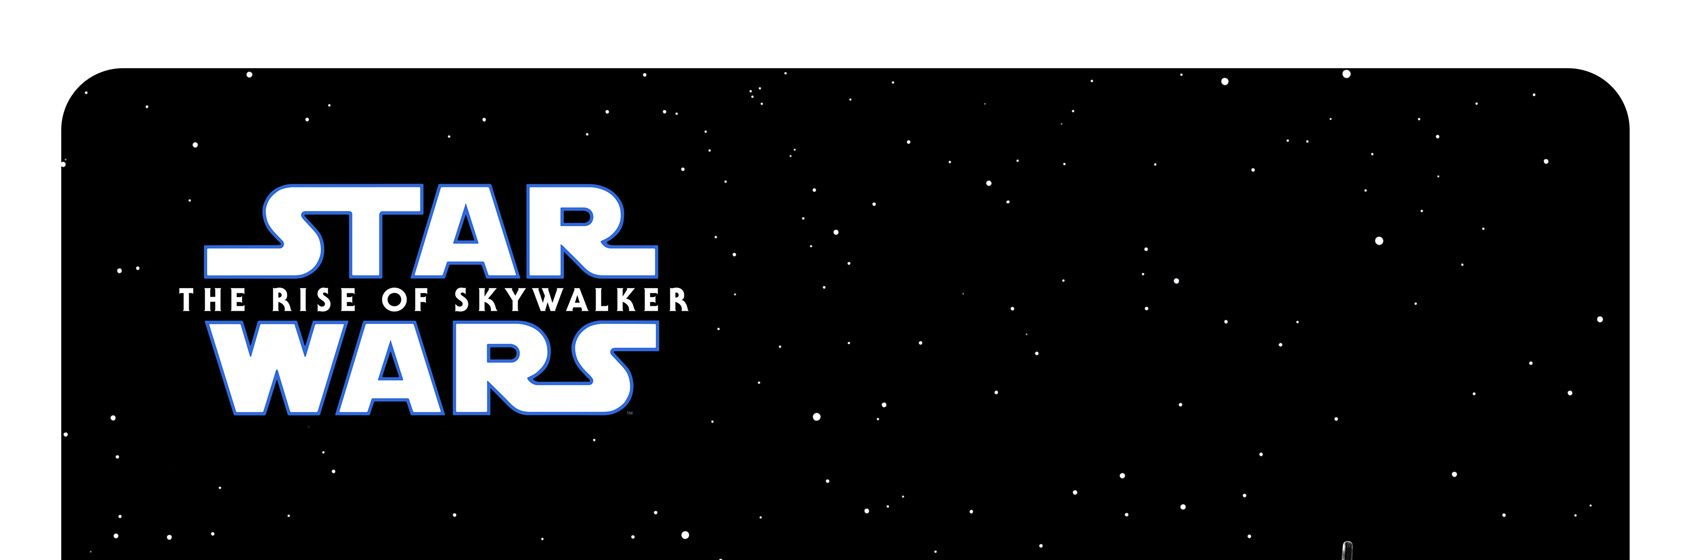 Star Wars The Rise of SKywalker R2-D2